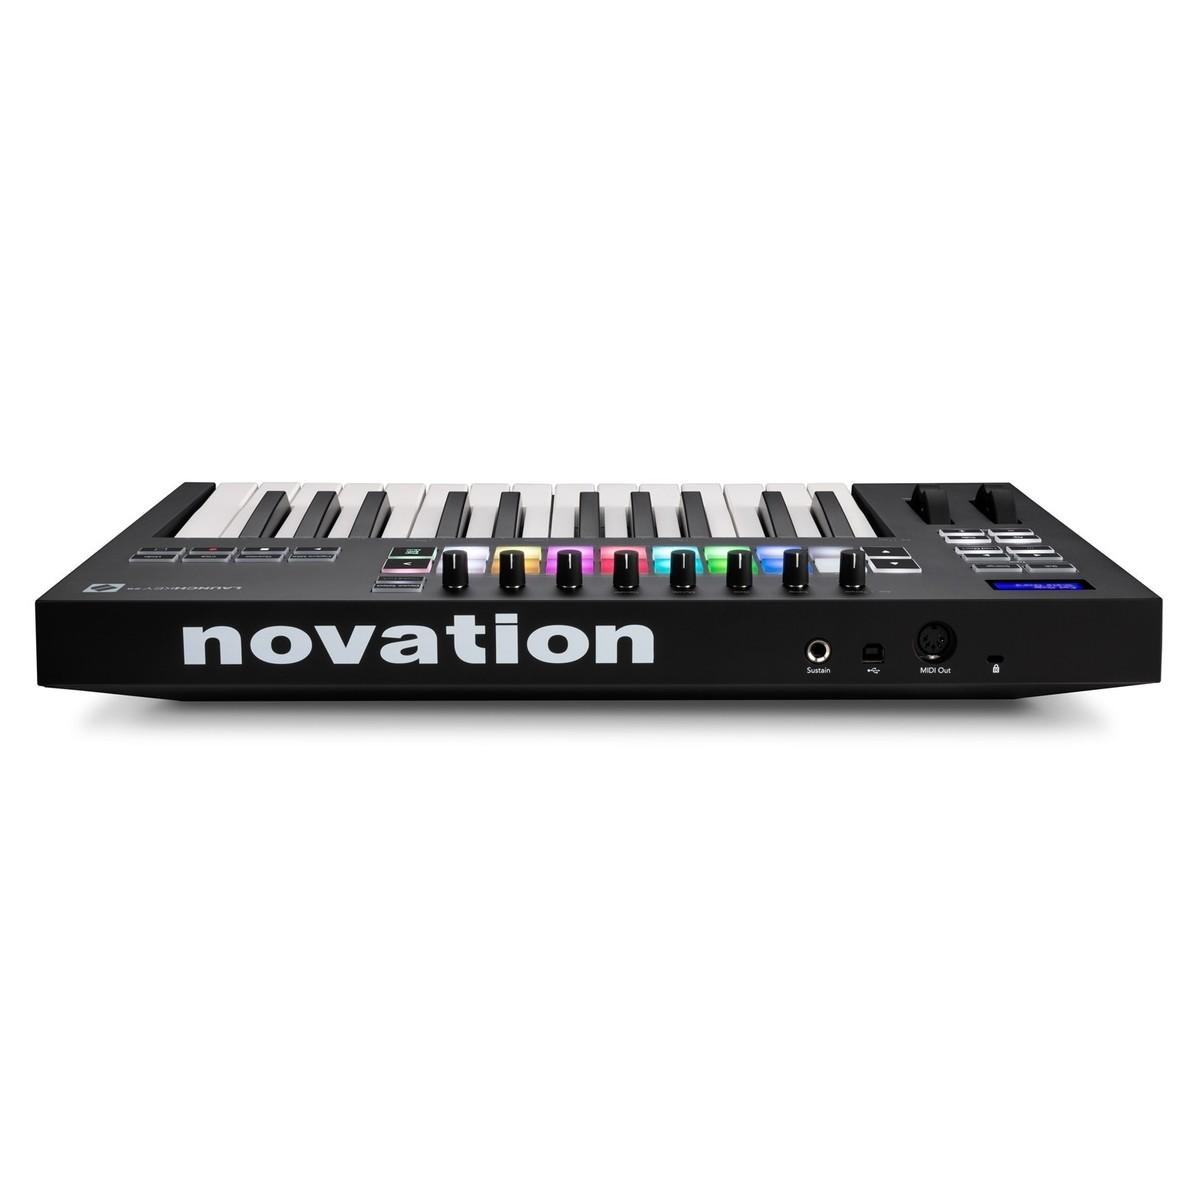 NOVATION LAUNCHKEY 25 MK3 TASTIERA CONTROLLER MIDI USB 25 TASTI 1